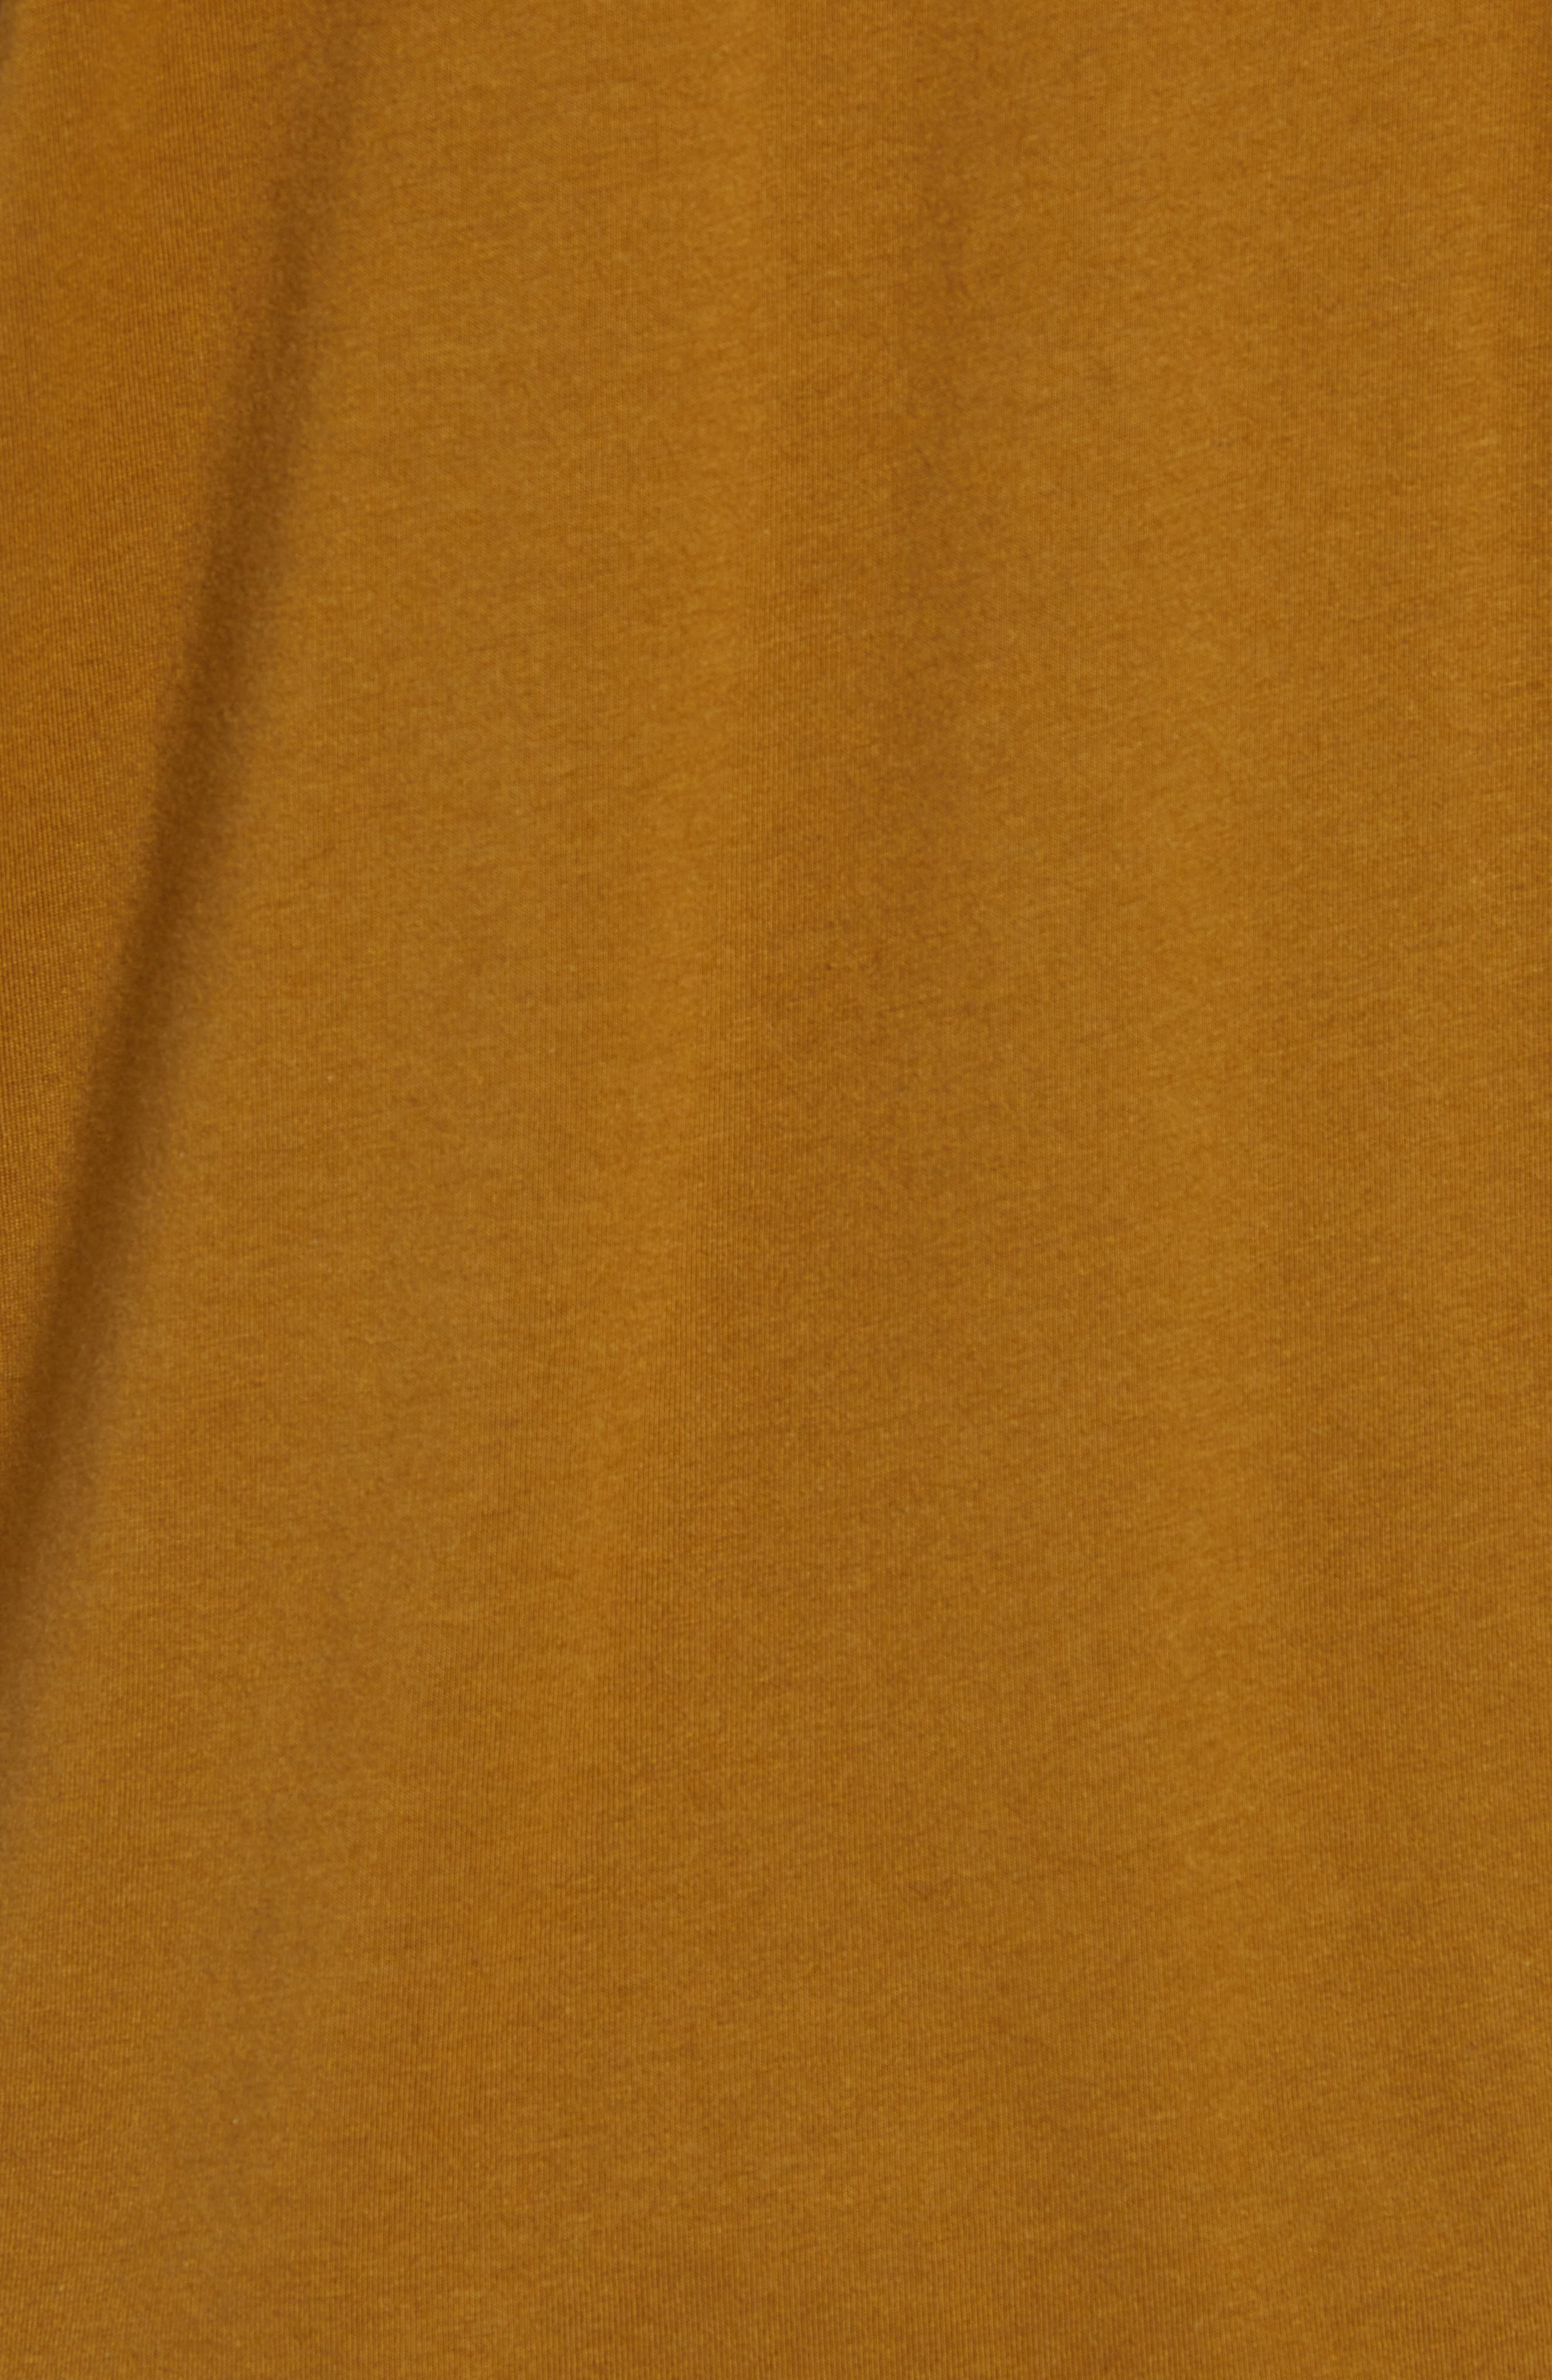 Bryce Slim Fit T-Shirt,                             Alternate thumbnail 5, color,                             GOLDEN OLIVE